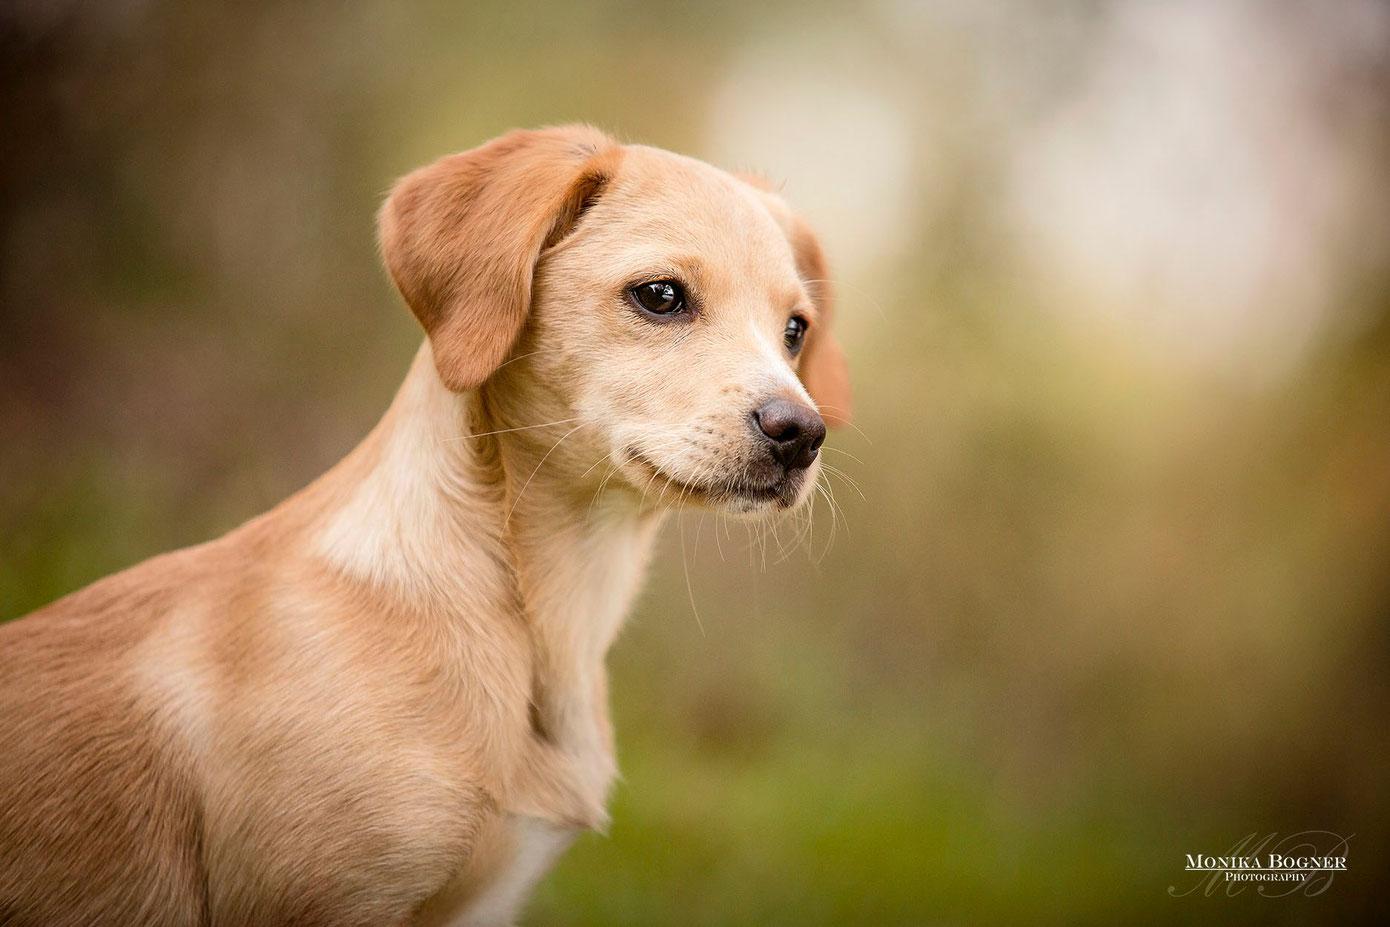 Hundewelpe im Herbst, Fotoshooting mit Hund